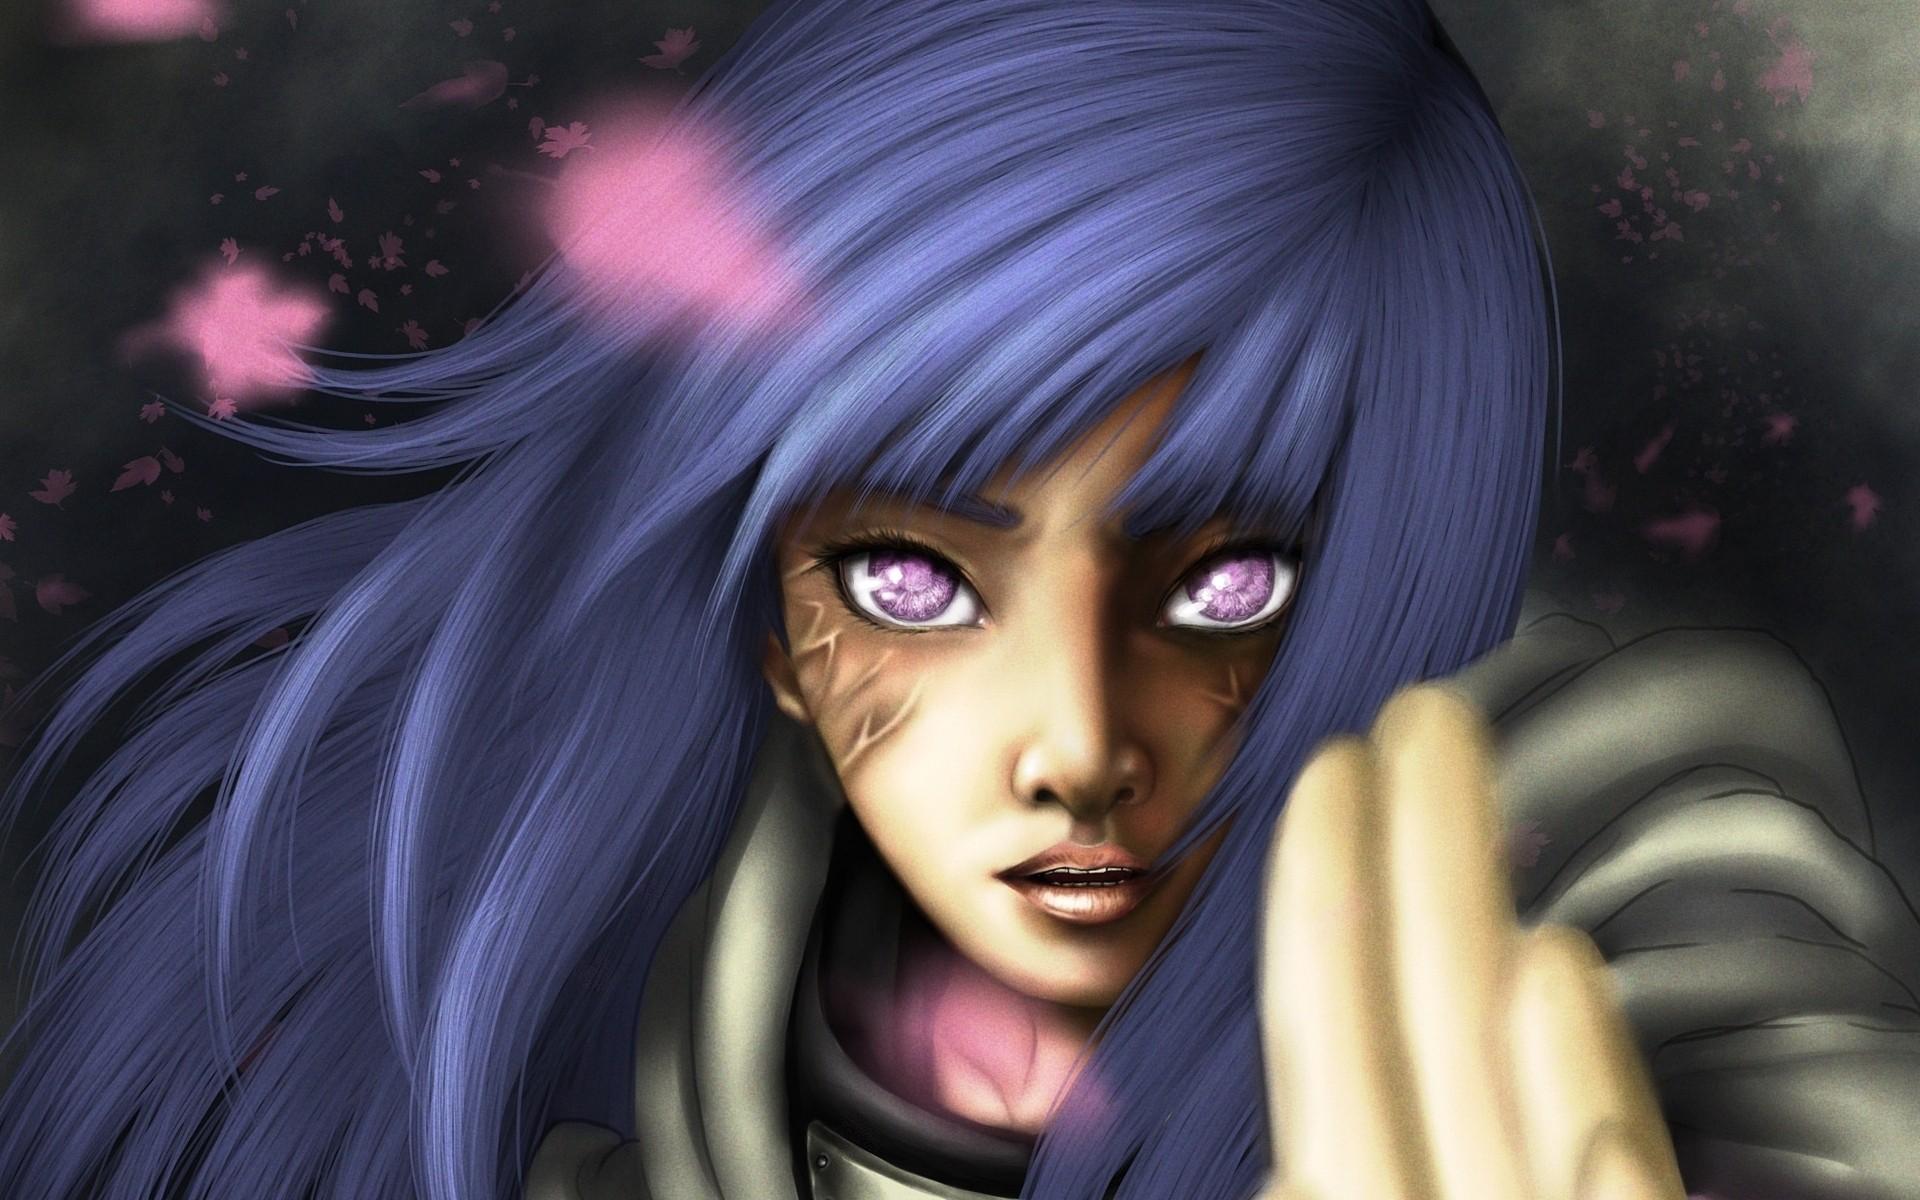 fantasy girl anime anime girls manga blue black hair Naruto Shippuuden hair Hyuuga Hinata Toy eye darkness screenshot computer wallpaper fictional character 209718